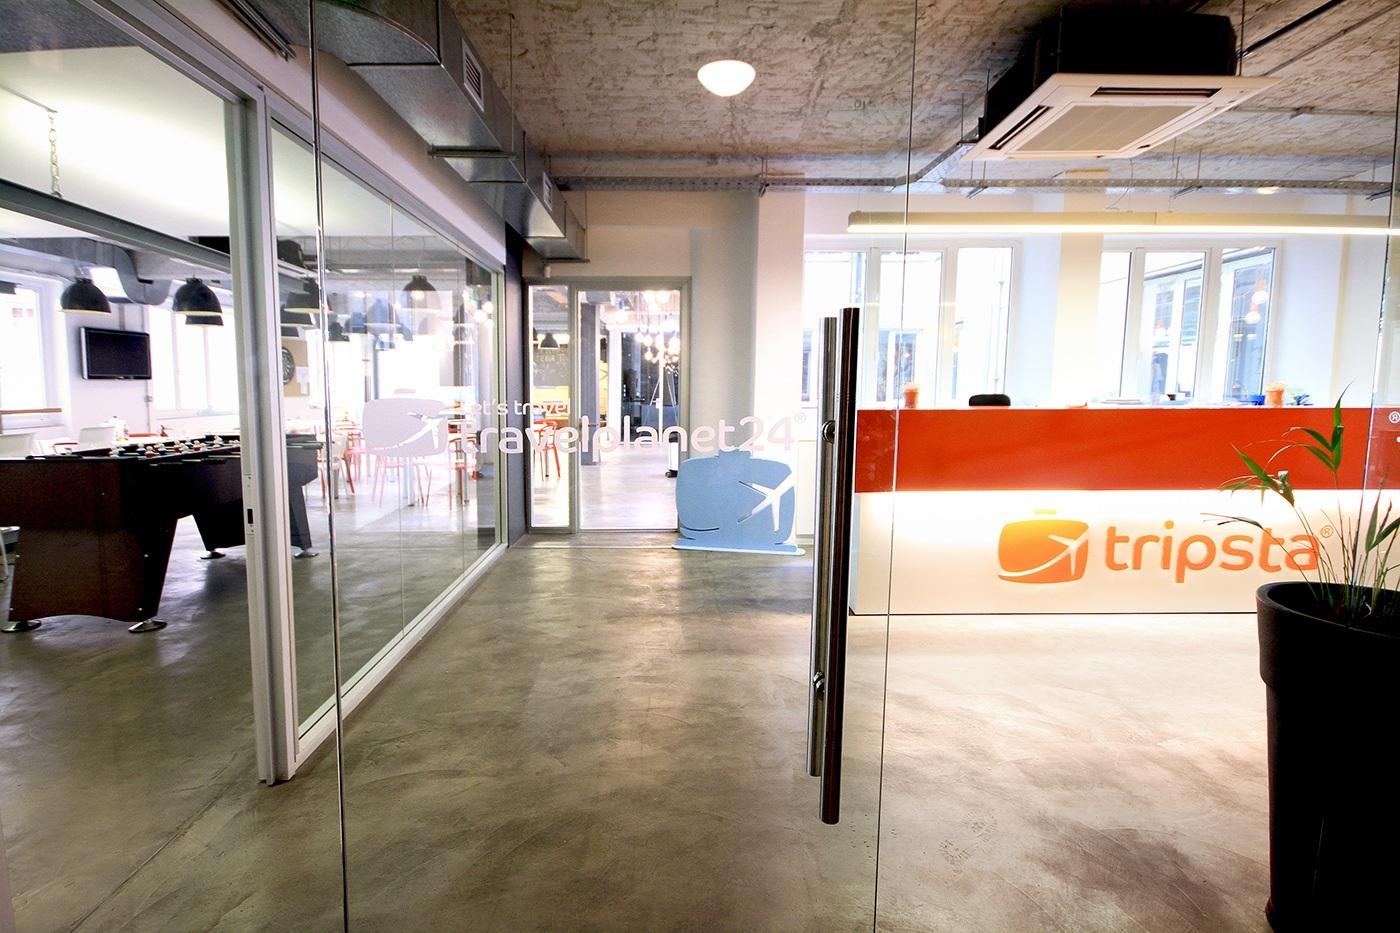 Travelplanet24/Tripsta's Athens Headquarters